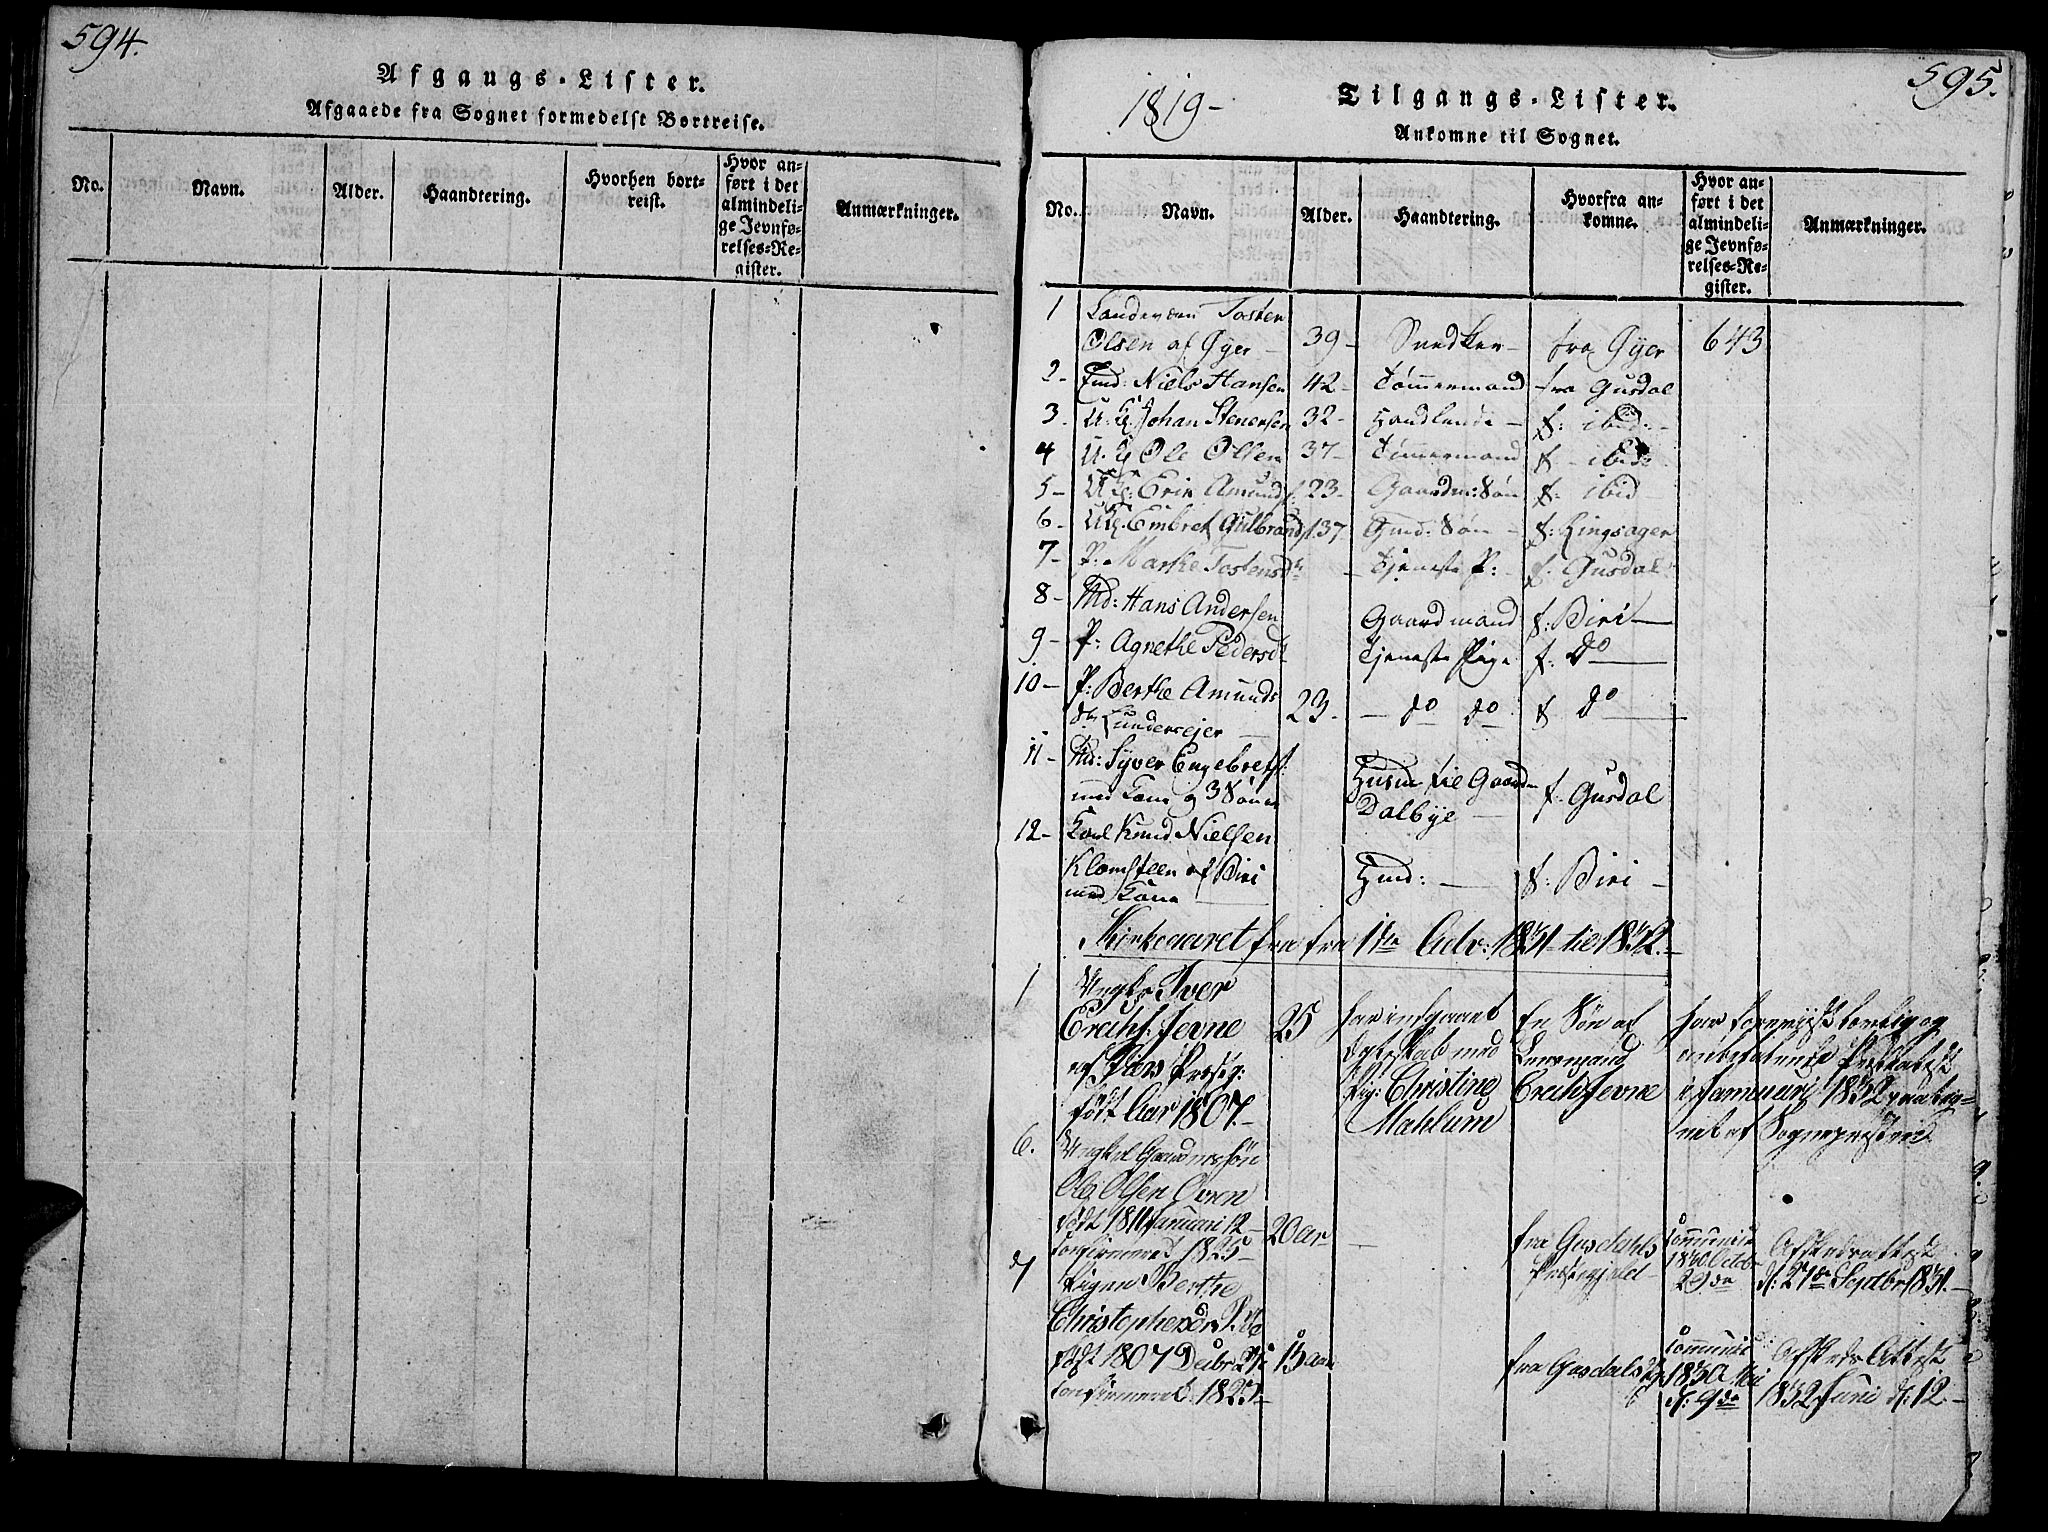 SAH, Fåberg prestekontor, Klokkerbok nr. 4, 1818-1837, s. 594-595